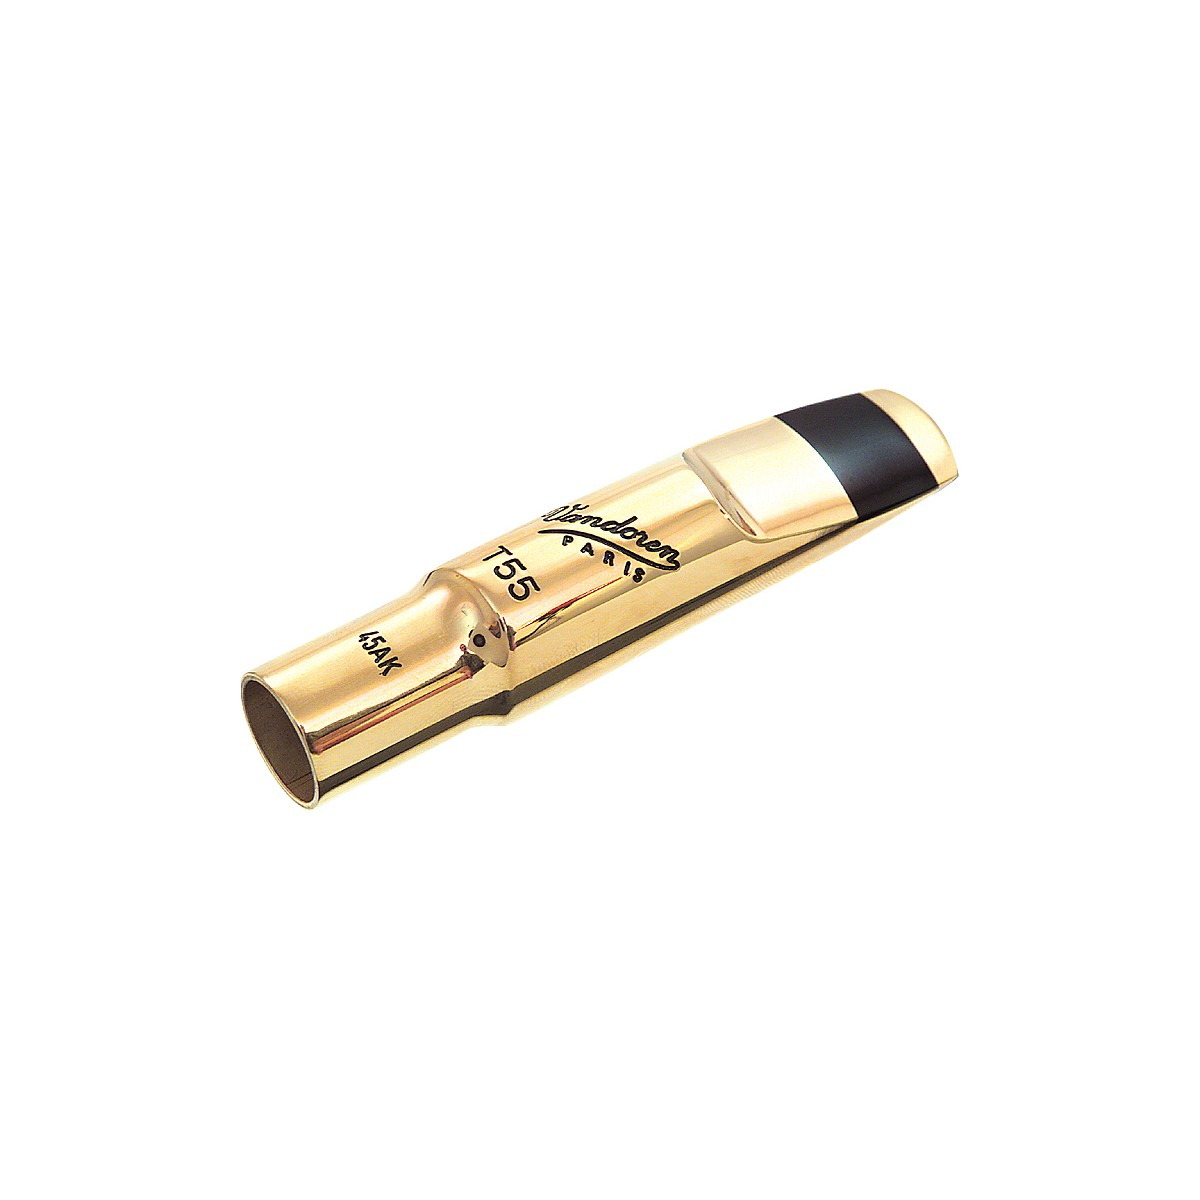 Vandoren V16 Metal Tenor Saxophone Mouthpiece